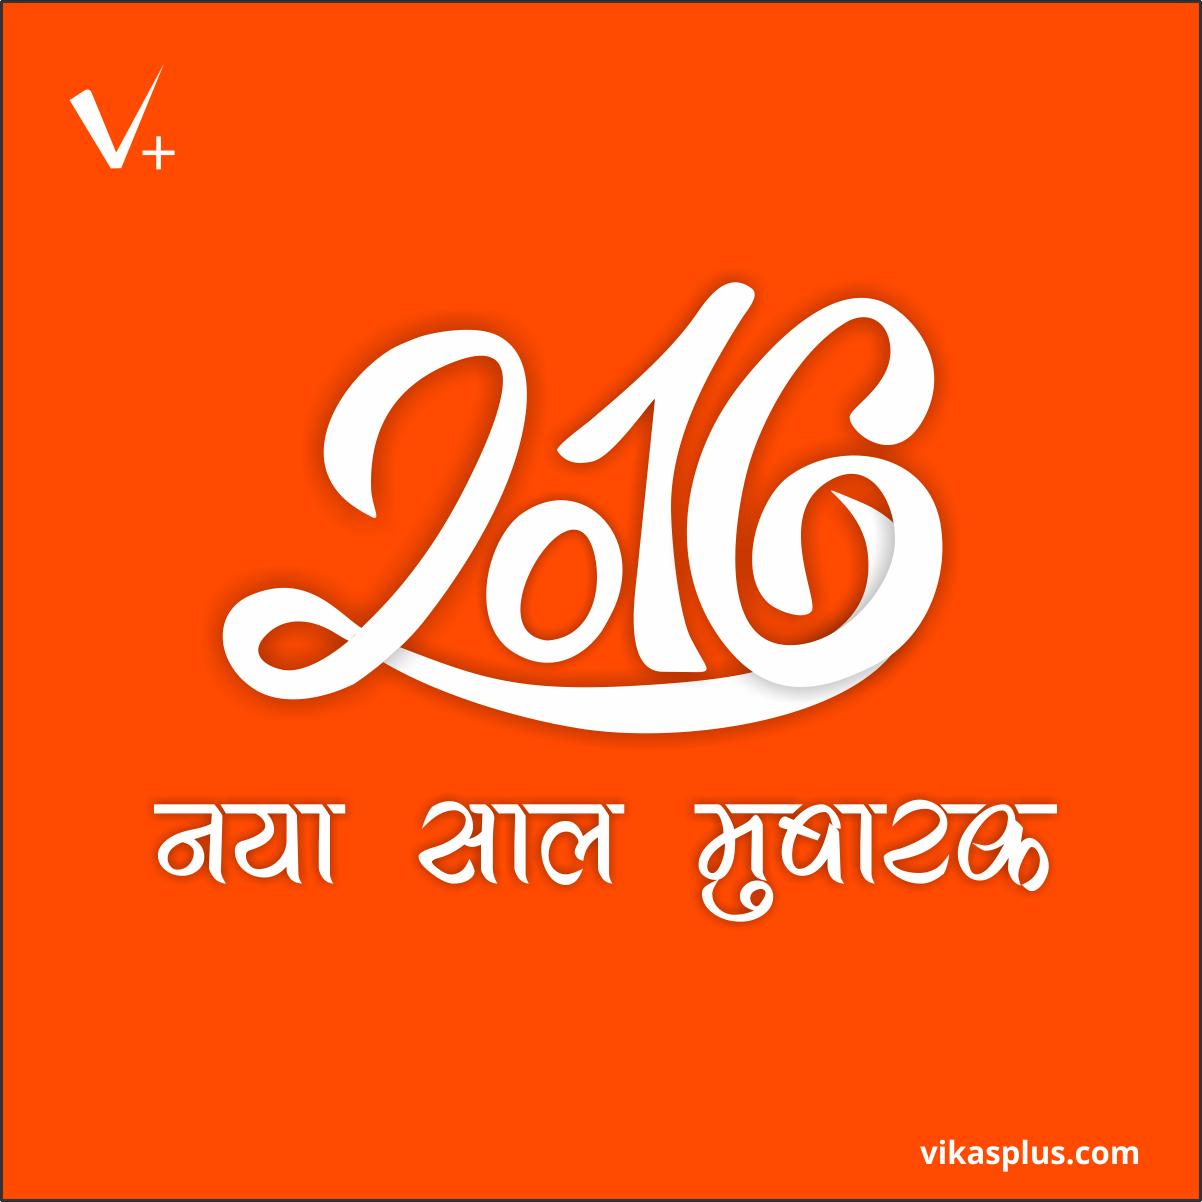 vikasplus-happy-new-year-4